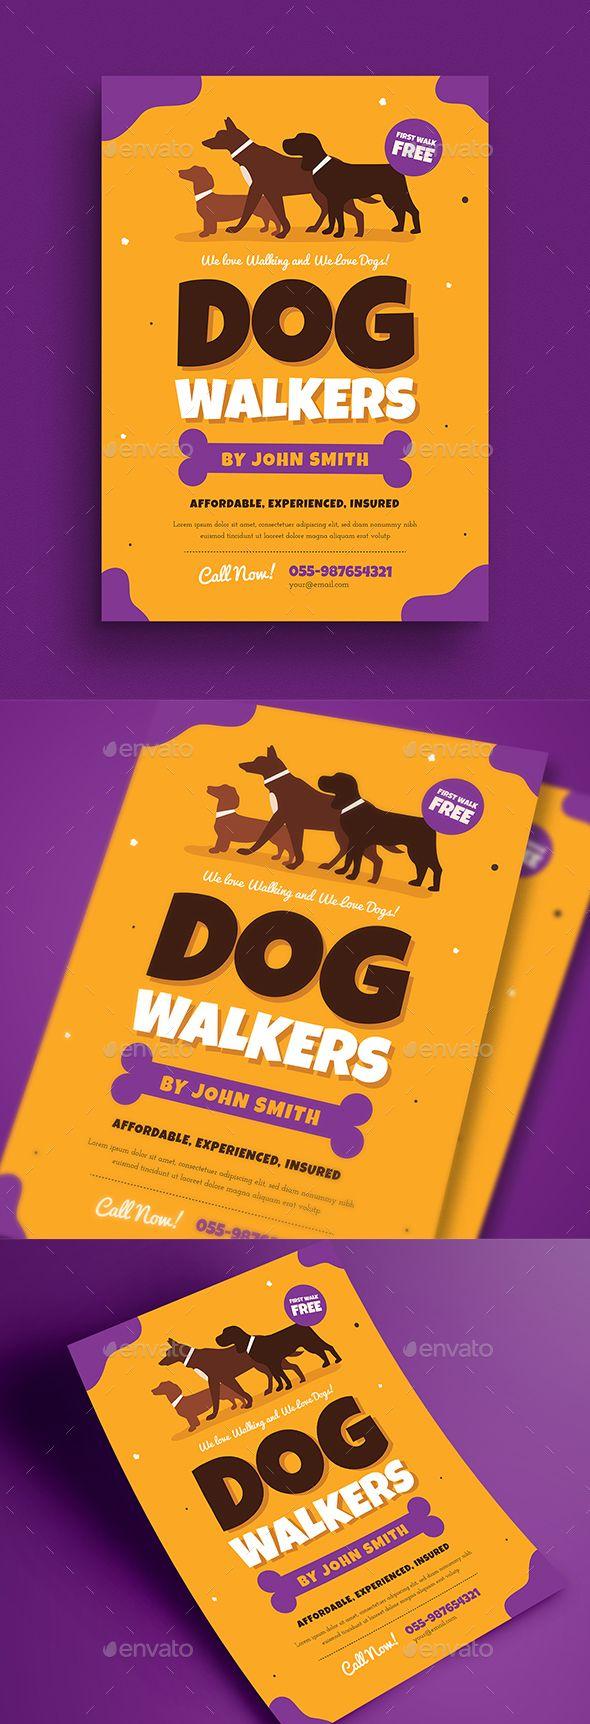 Dog Walkers Flyer Template PSD, AI Illustrator